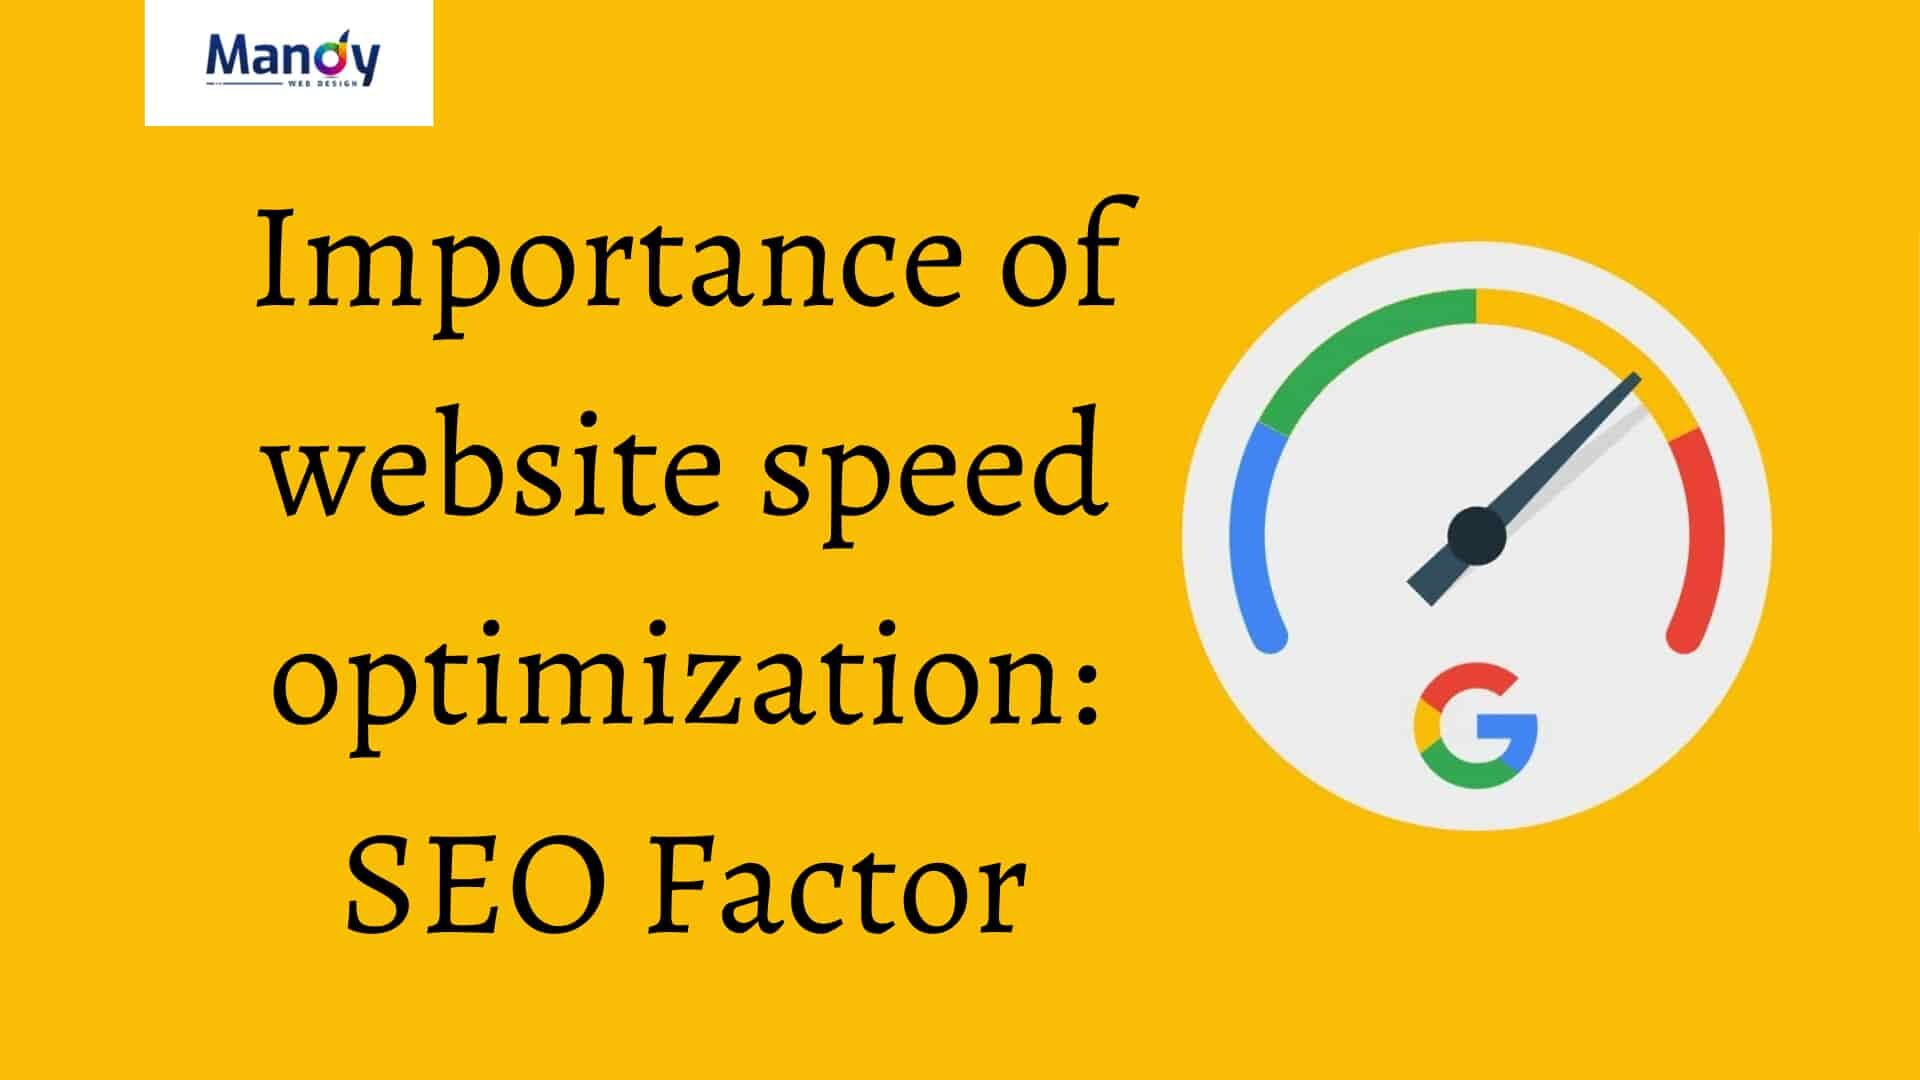 Web Speed Importance - Mandy Web Design